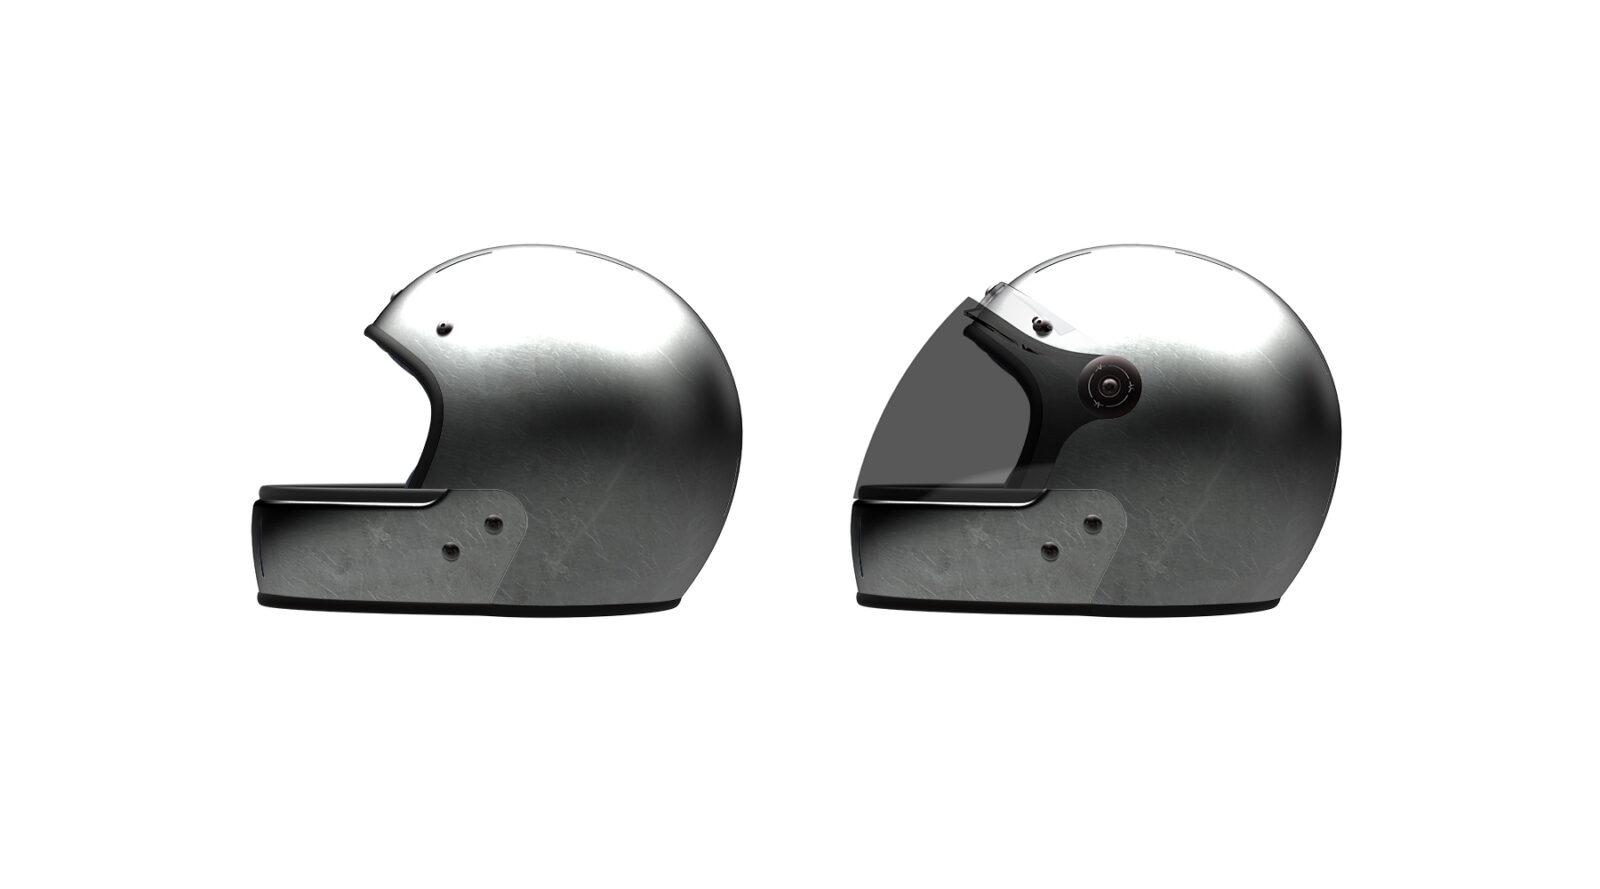 Veldt Motorcycle Helmets 1 1600x889 - Silver Foil Veldt Motorcycle Helmet